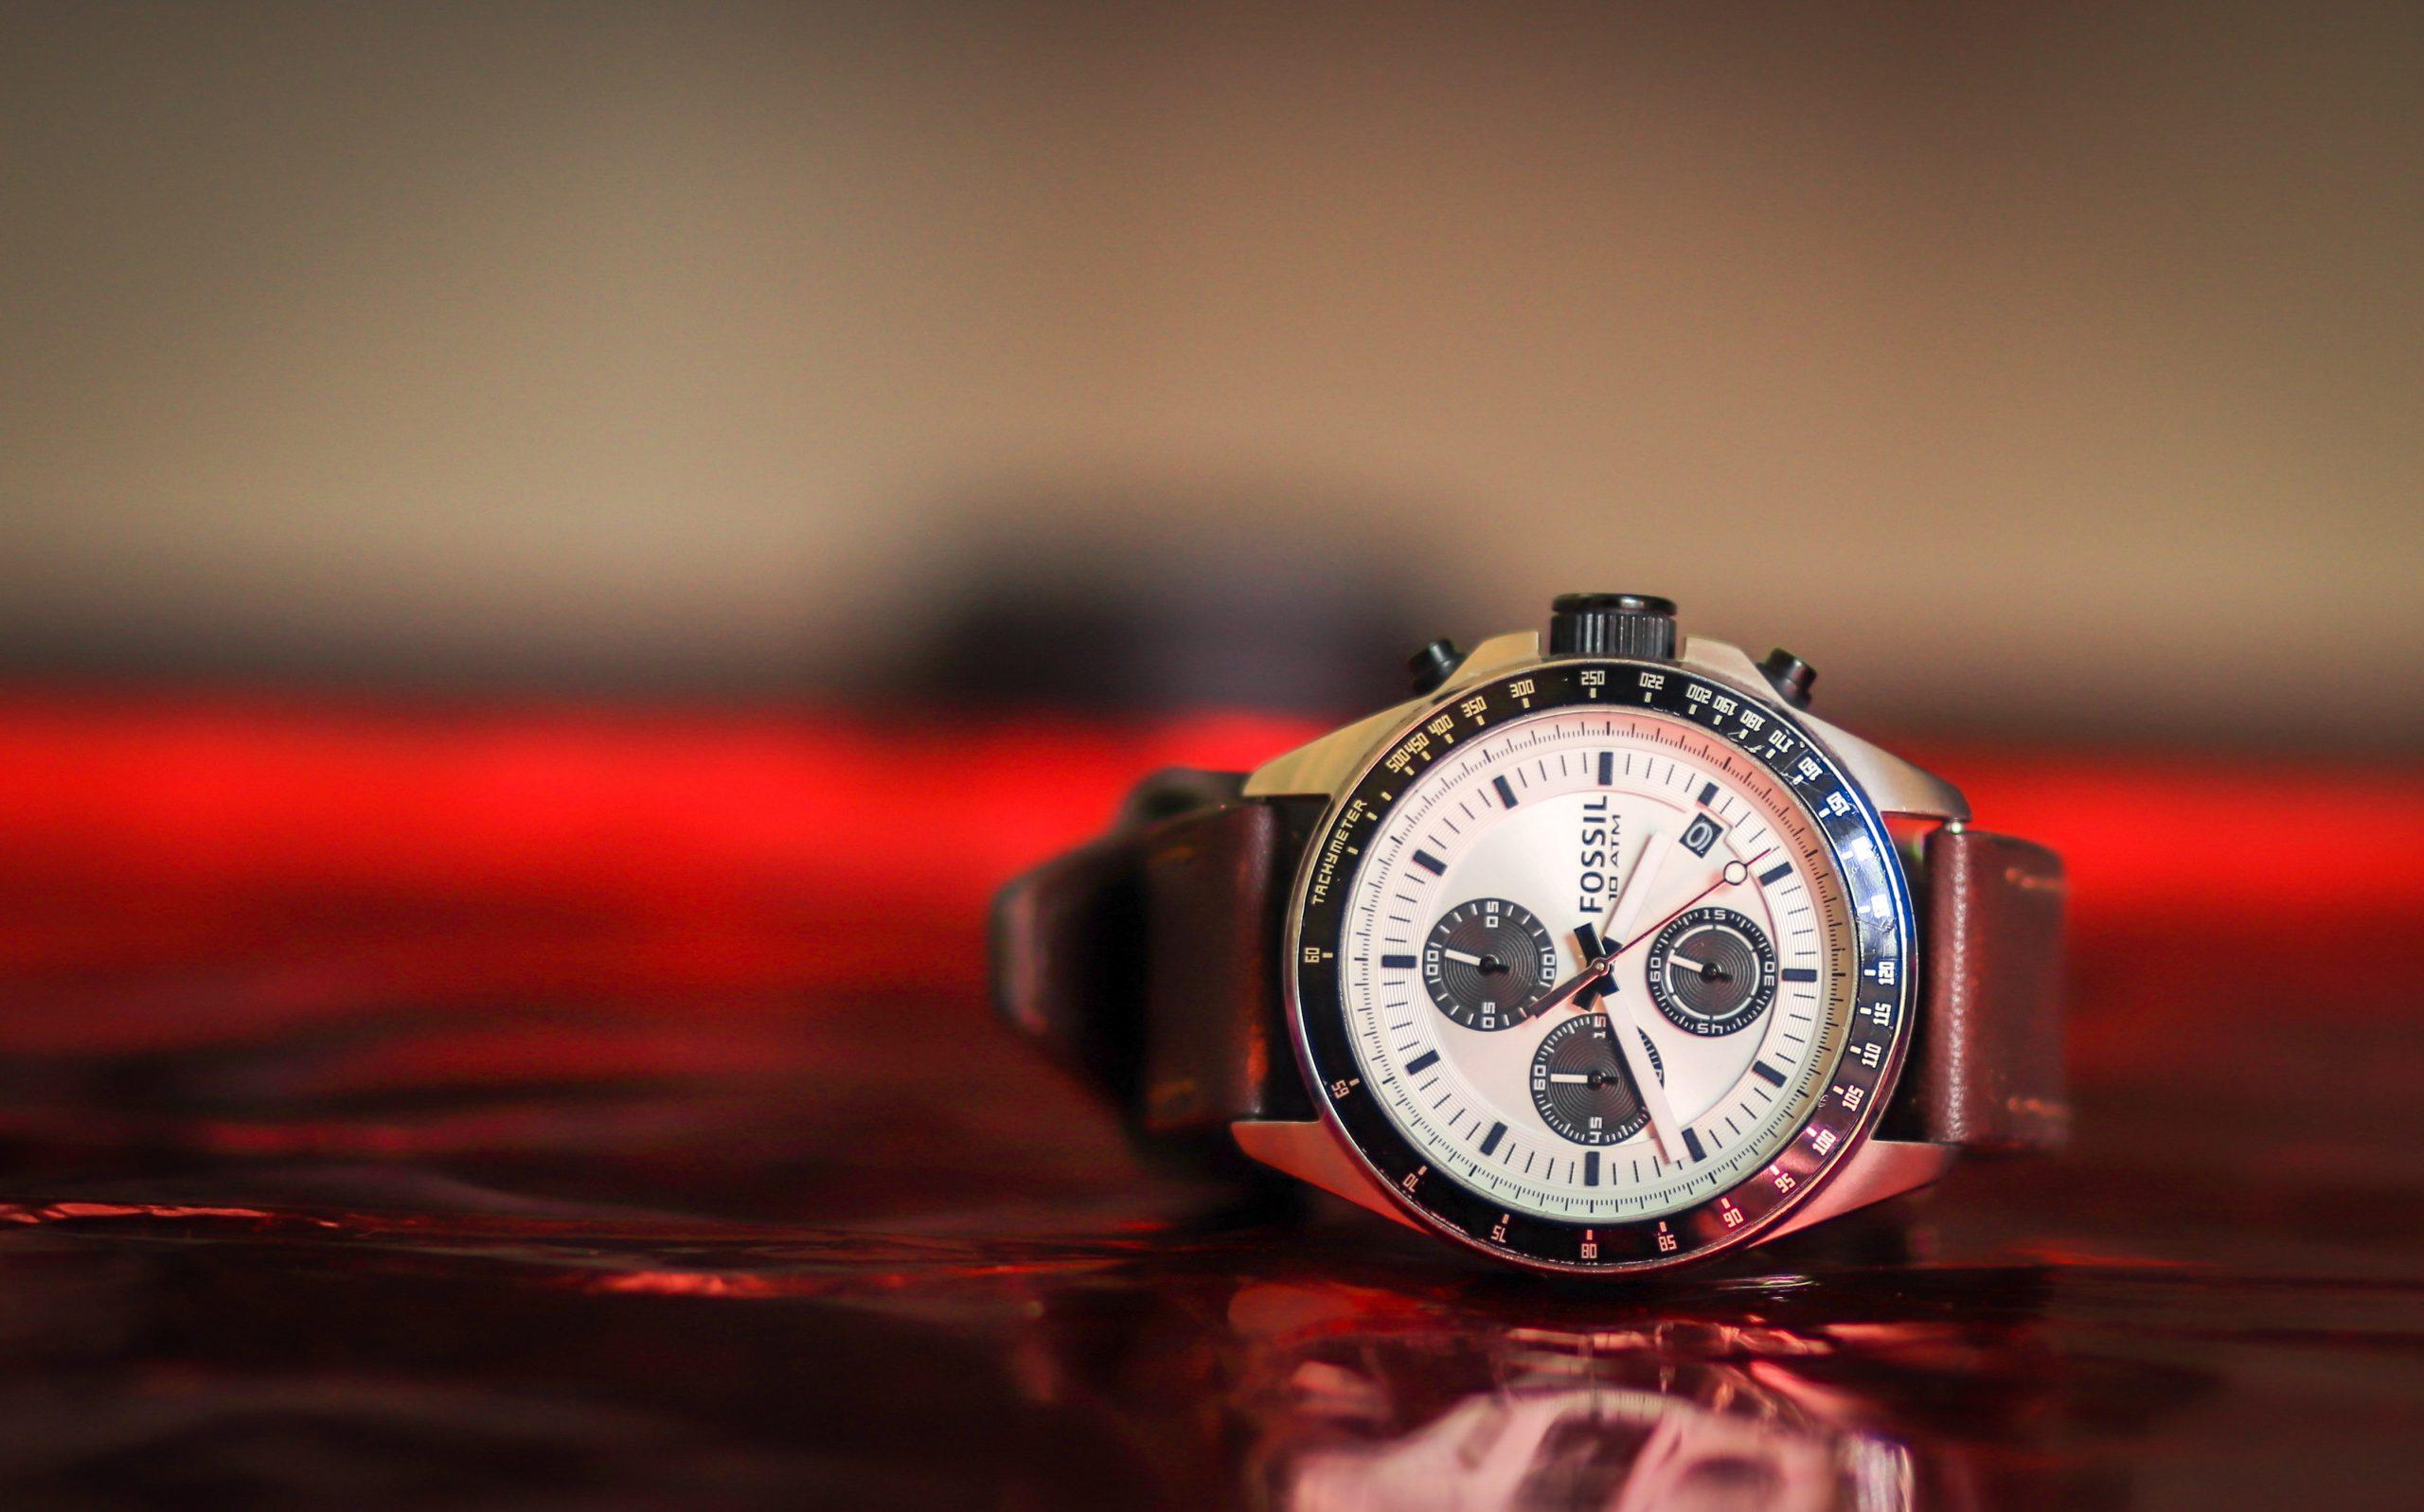 Descopera cum trebuie sa alegi ceasul in functie de propriul stil